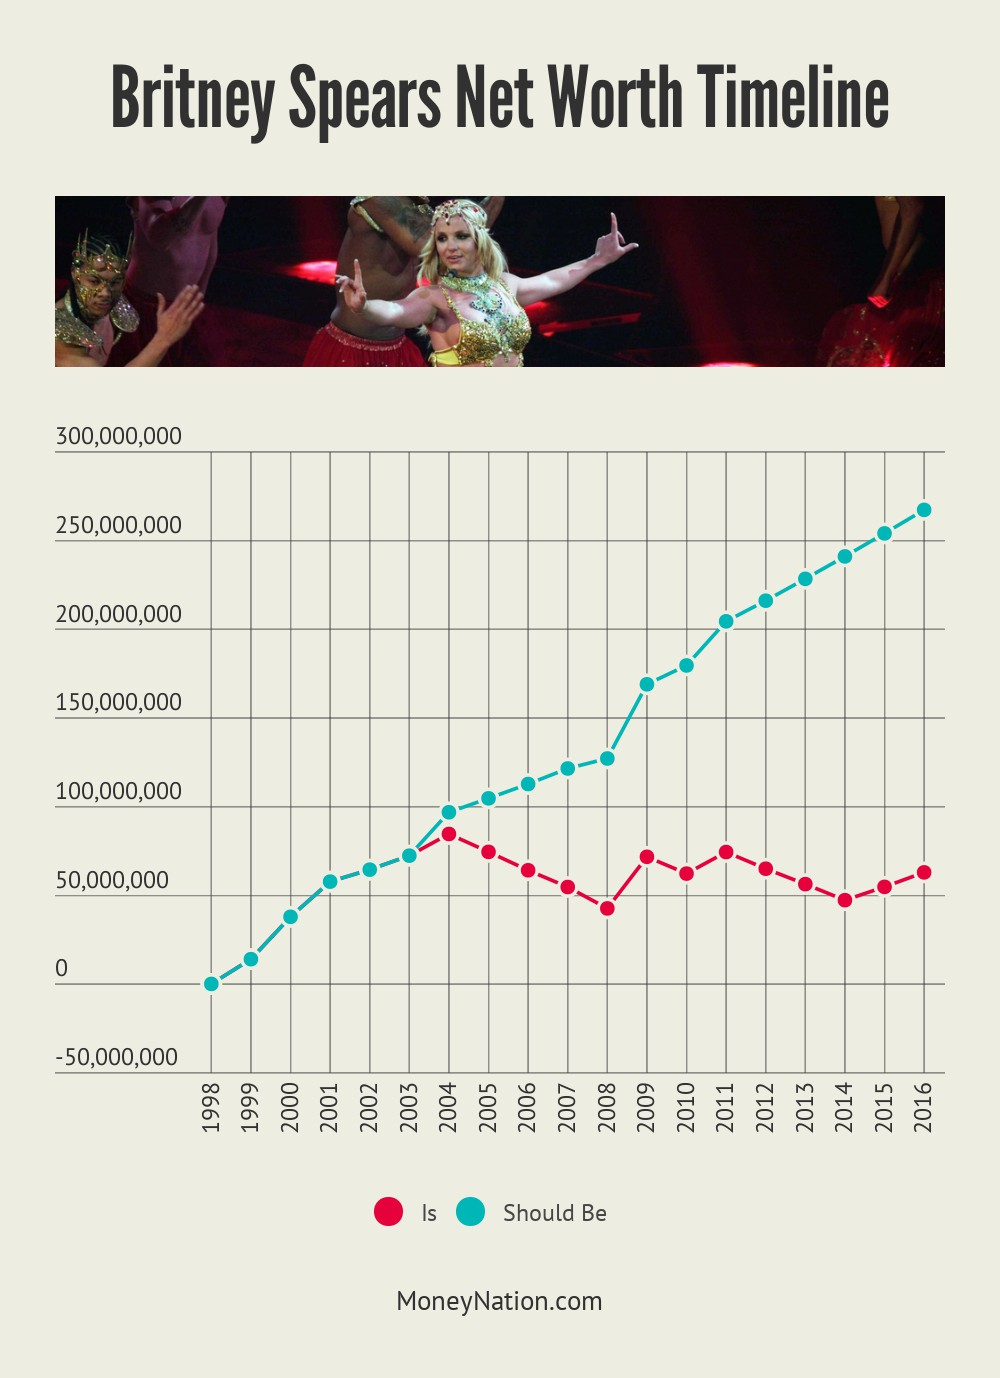 Britney Spears Net Worth Timeline